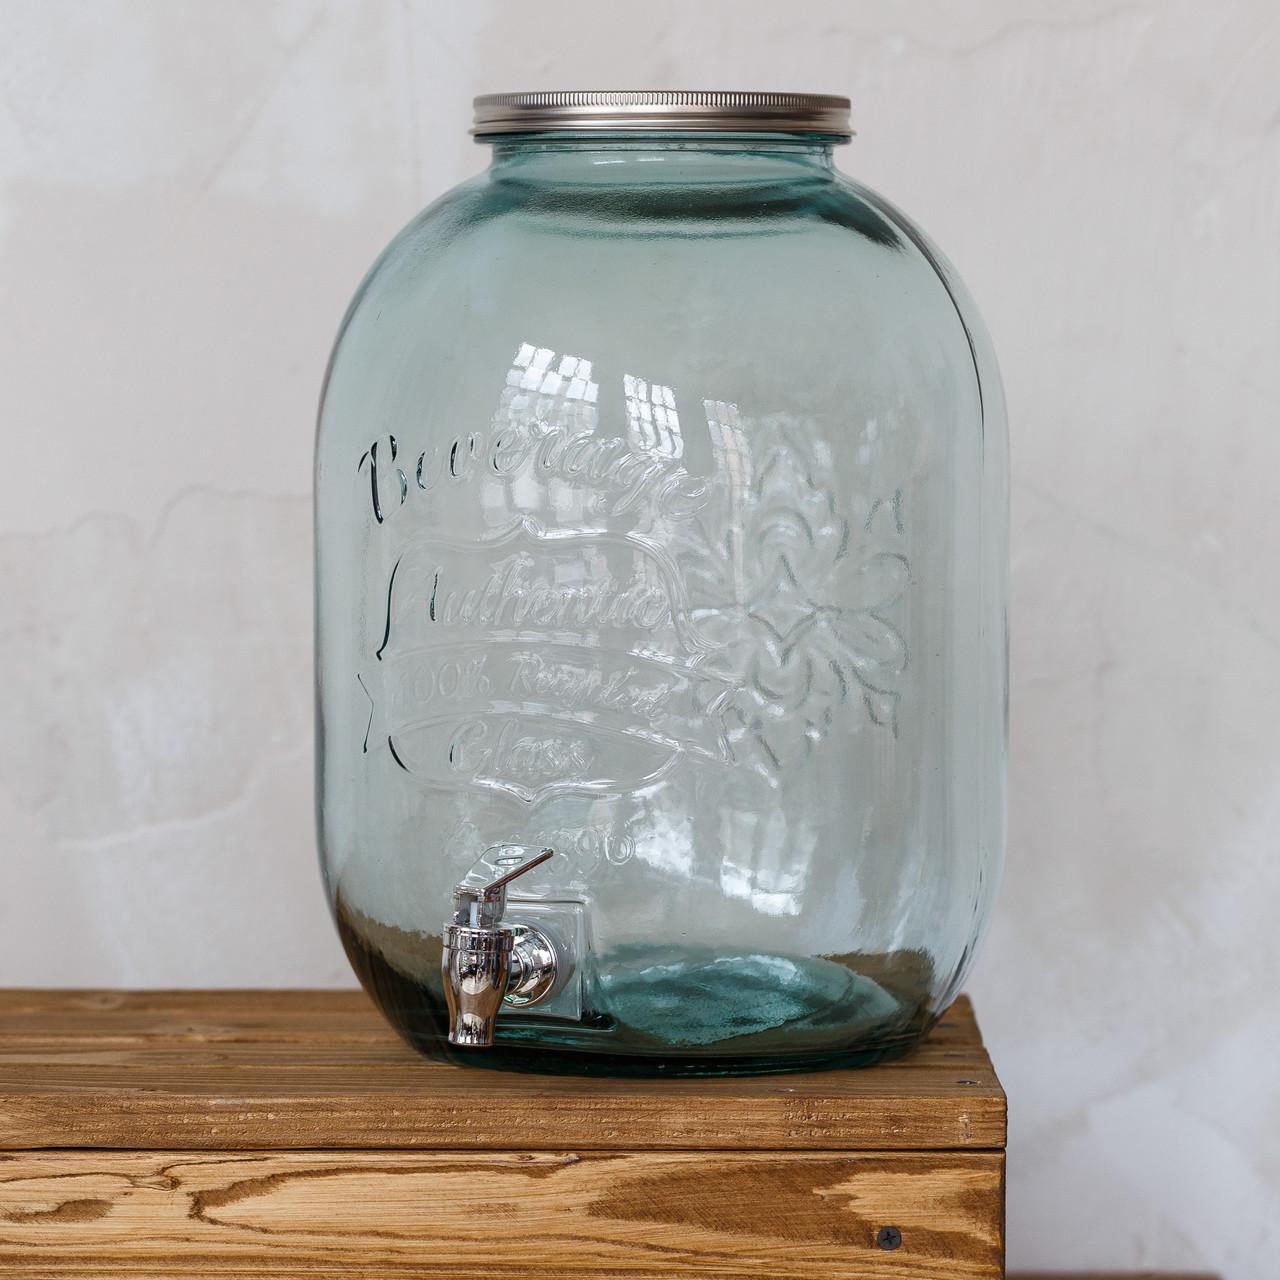 Лимонадник 12,5 L/ Банка с краником / Лимонадница / Диспенсер для напитков / Банка с краном